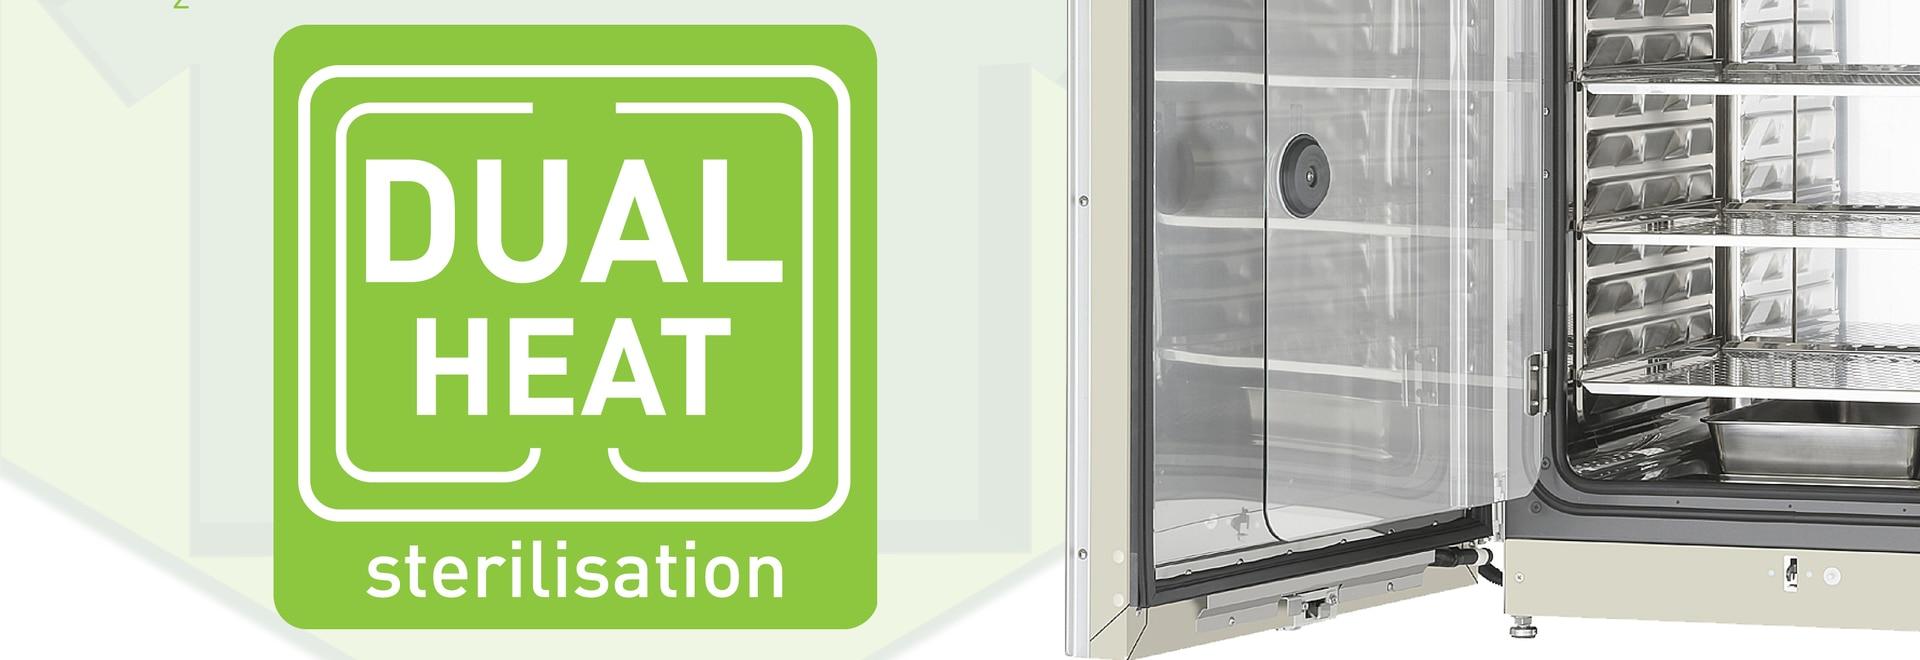 IncuSafe MCO-170AICD CO2 Incubators: Dual Heat Sterilisation